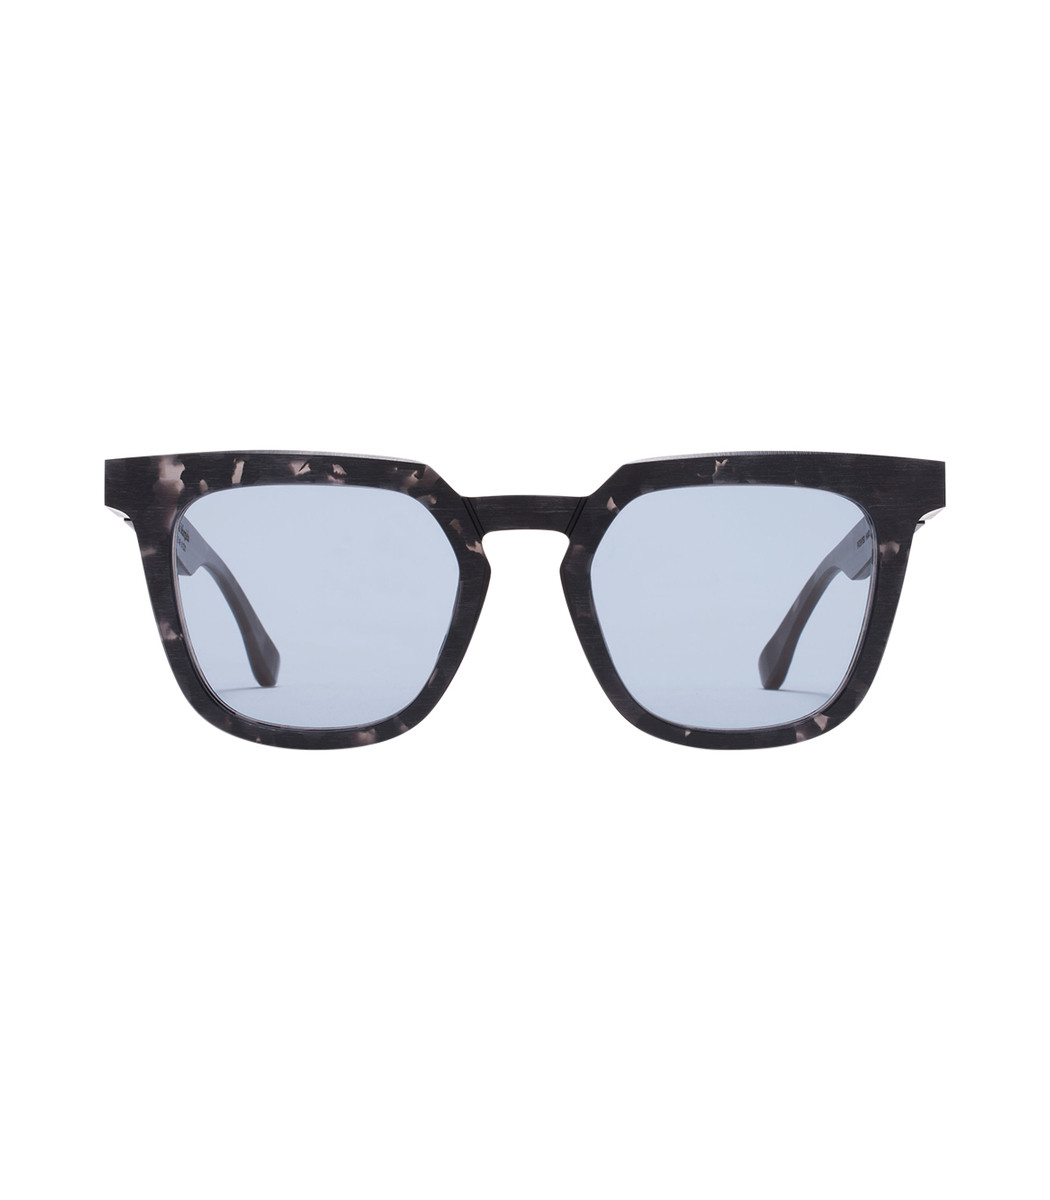 Mykita Black X Maison Margiela Havana Sunglasses